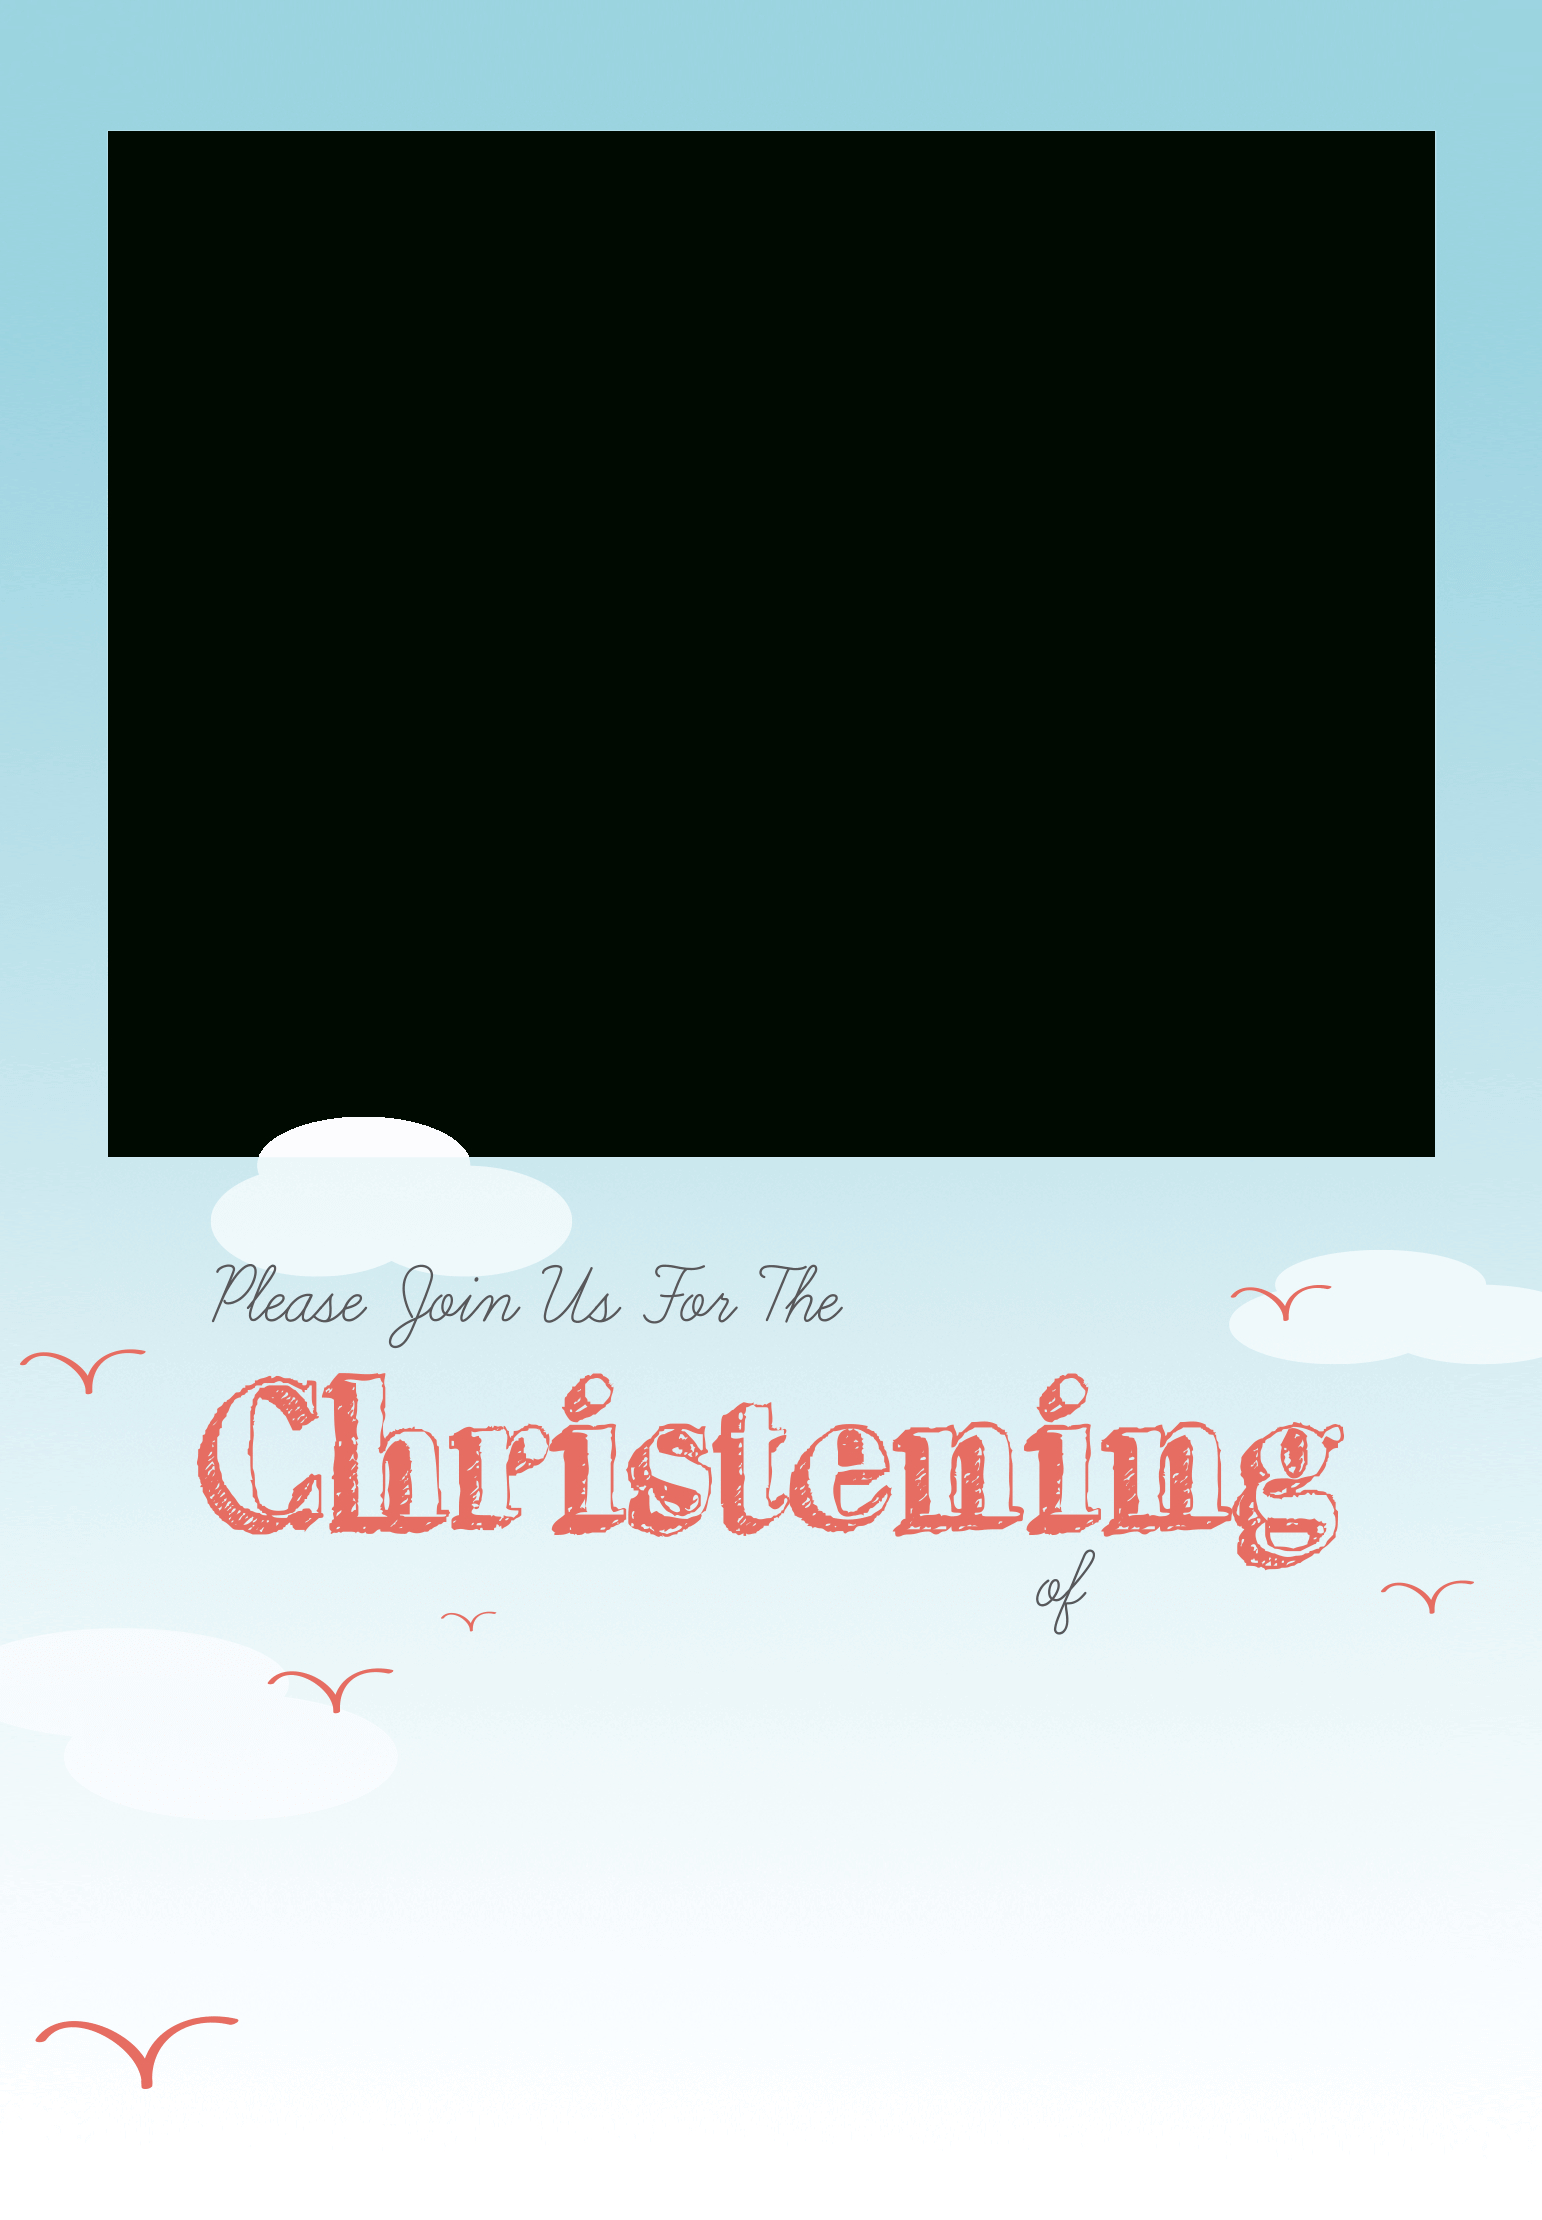 All Smiles - Free Printable Baptism & Christening Invitation - Free Printable Baptism Greeting Cards